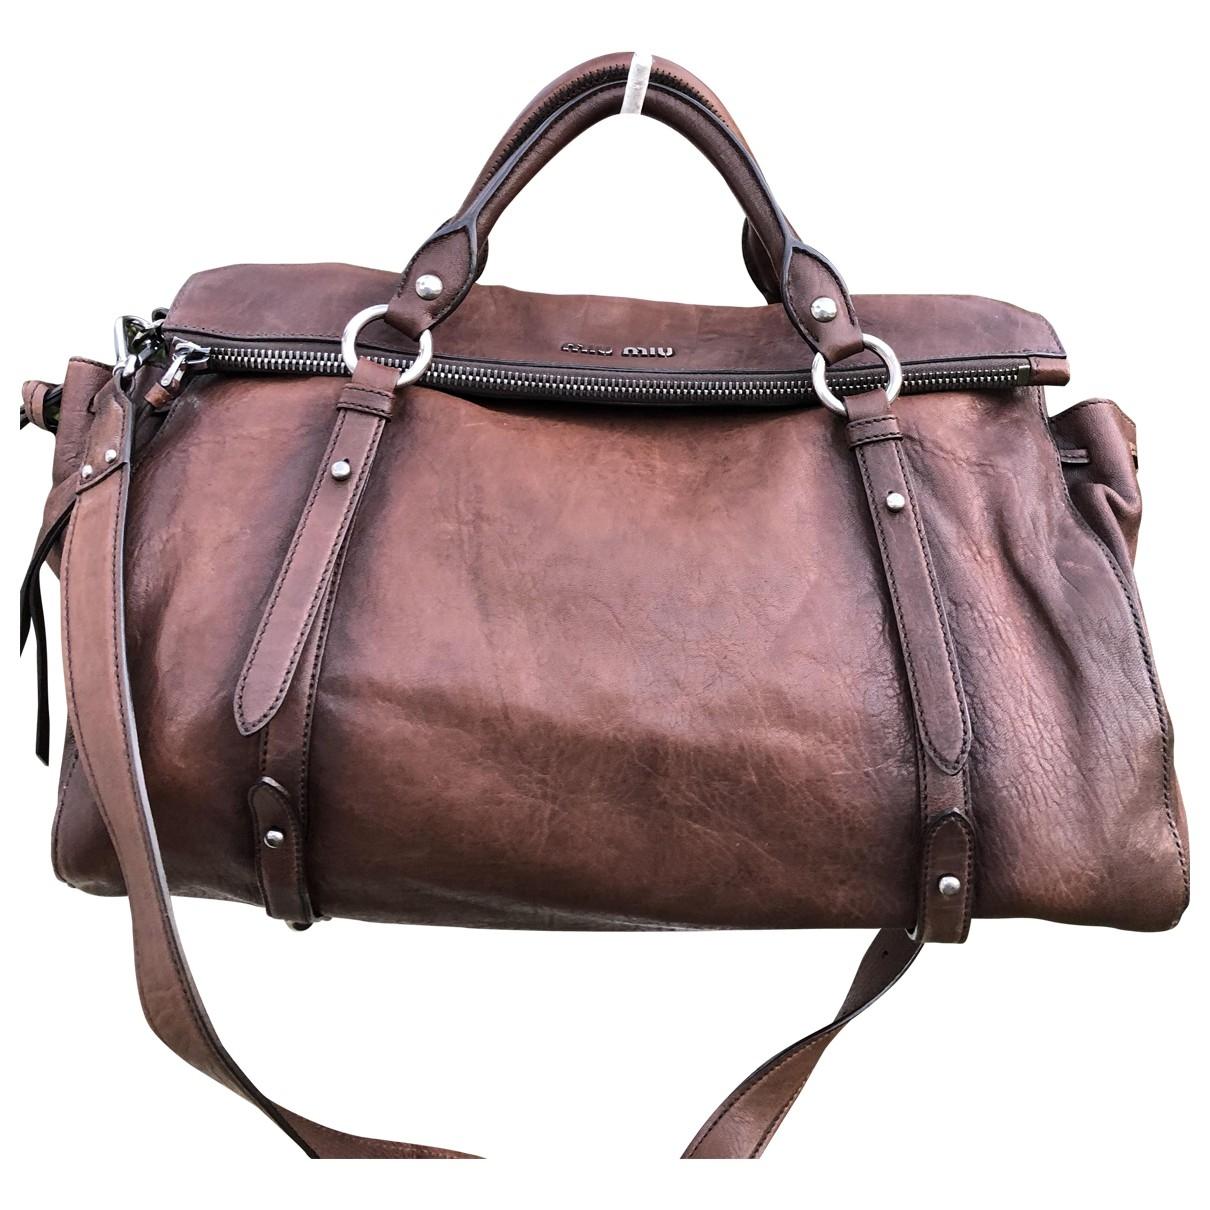 Miu Miu Bow bag Handtasche in  Braun Leder